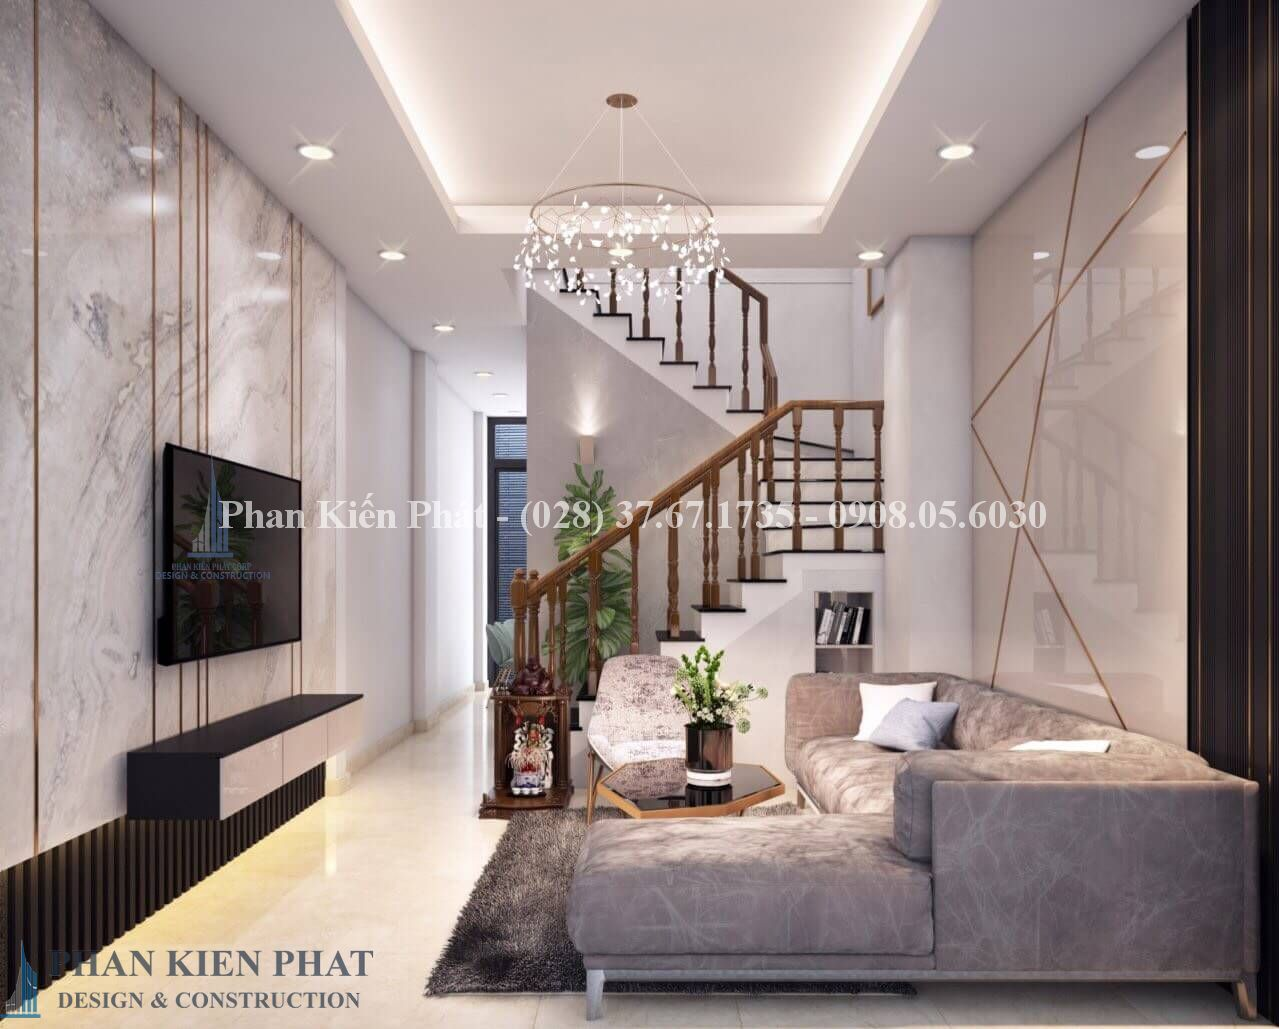 Thiet Ke Noi That Phong Khach View3 Tkxd